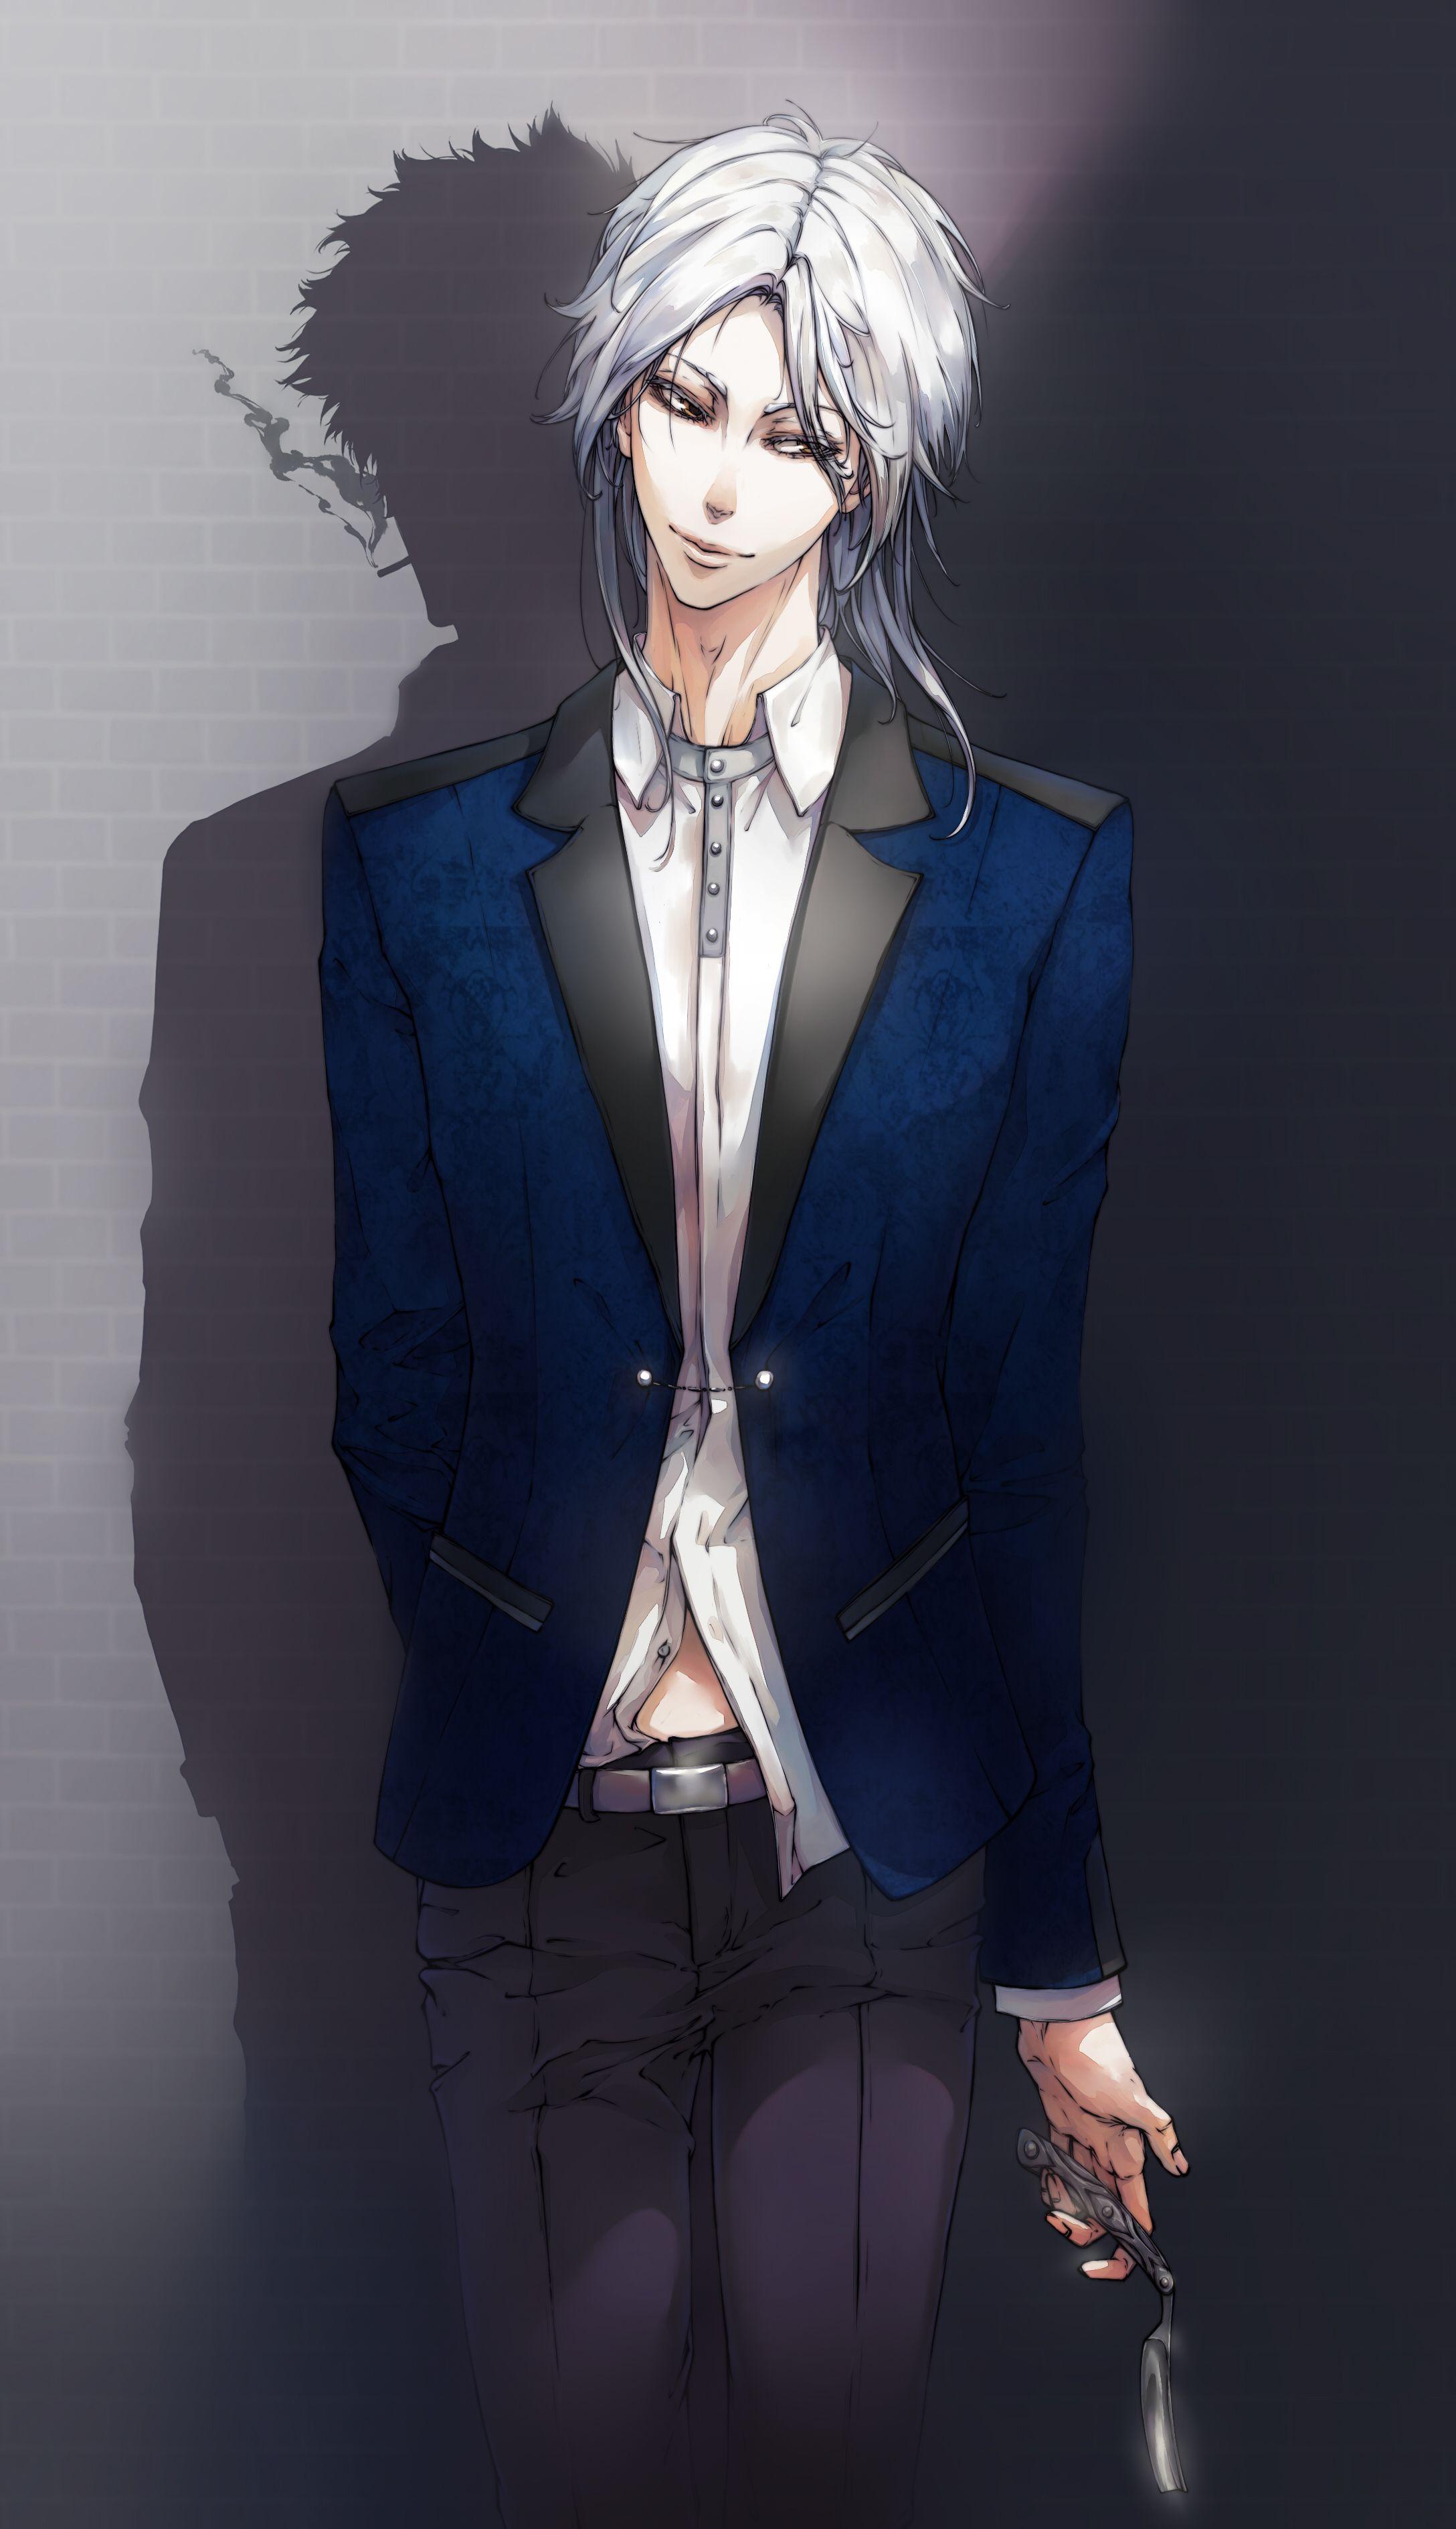 Psycho Pass my favorite anime 槙島聖護, アニメ, サイコパス